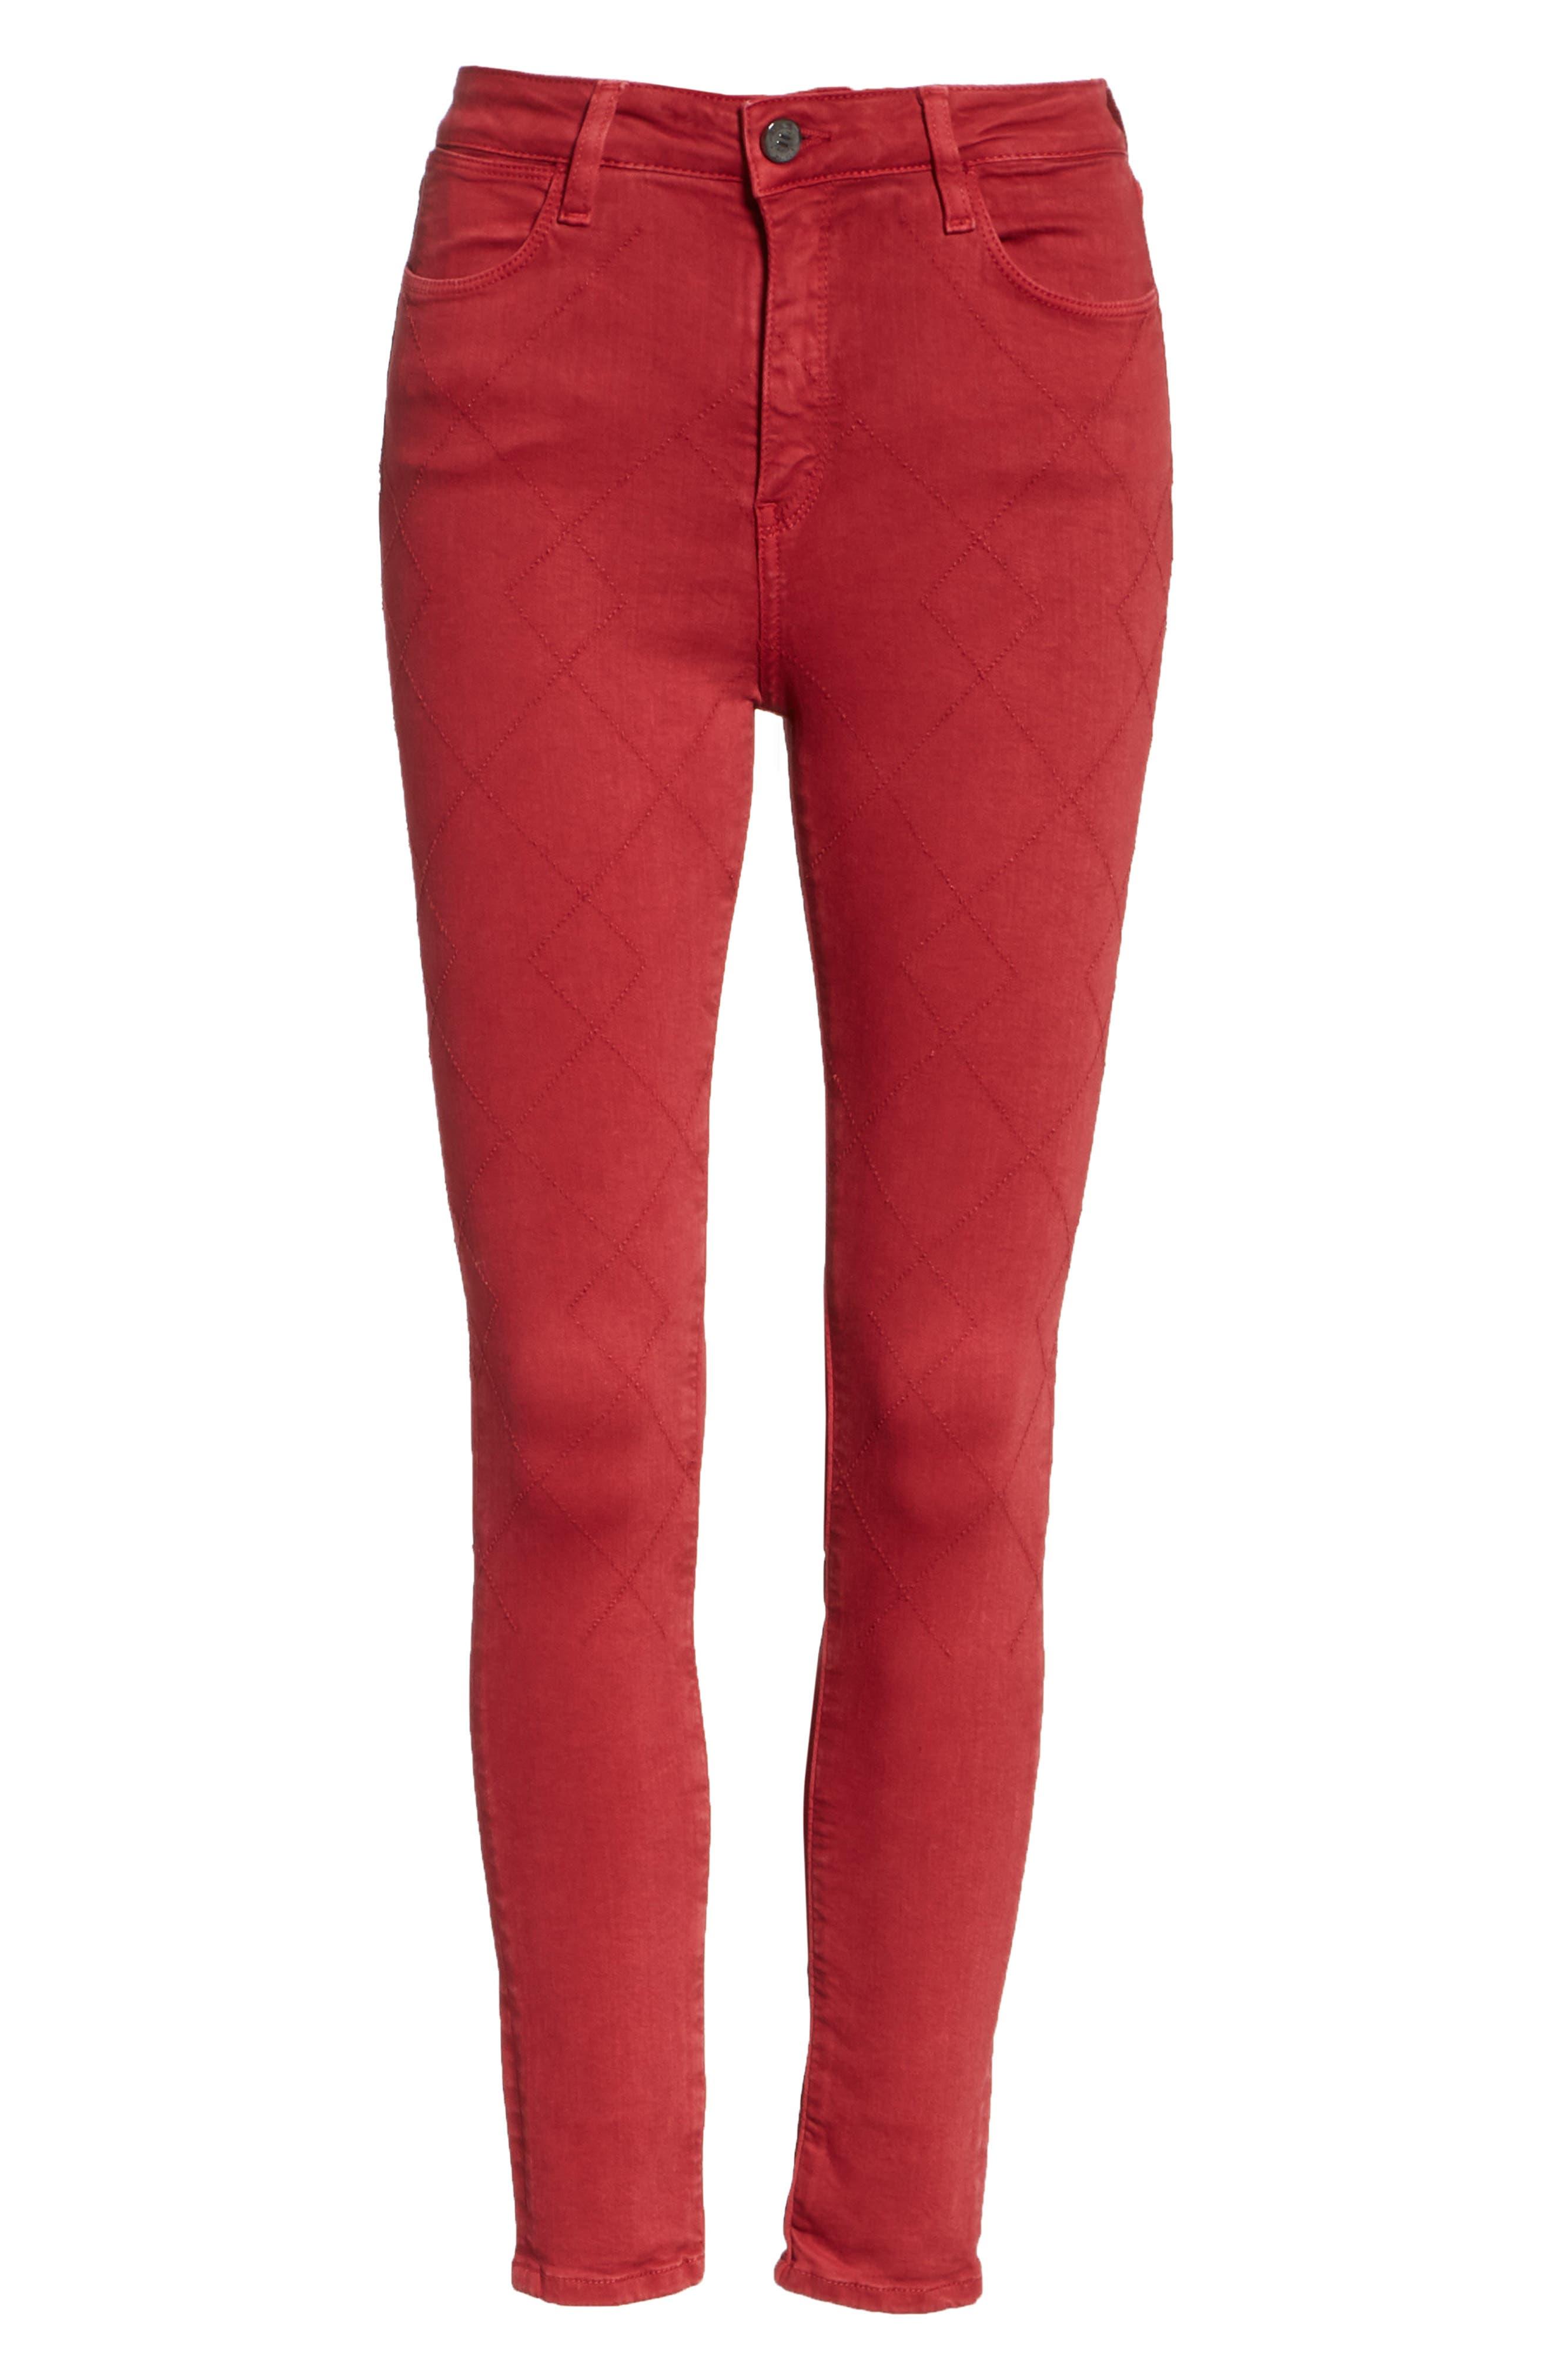 Rolling Old Reina Lattice Stitch Skinny Jeans,                             Alternate thumbnail 7, color,                             FRAMBOISE